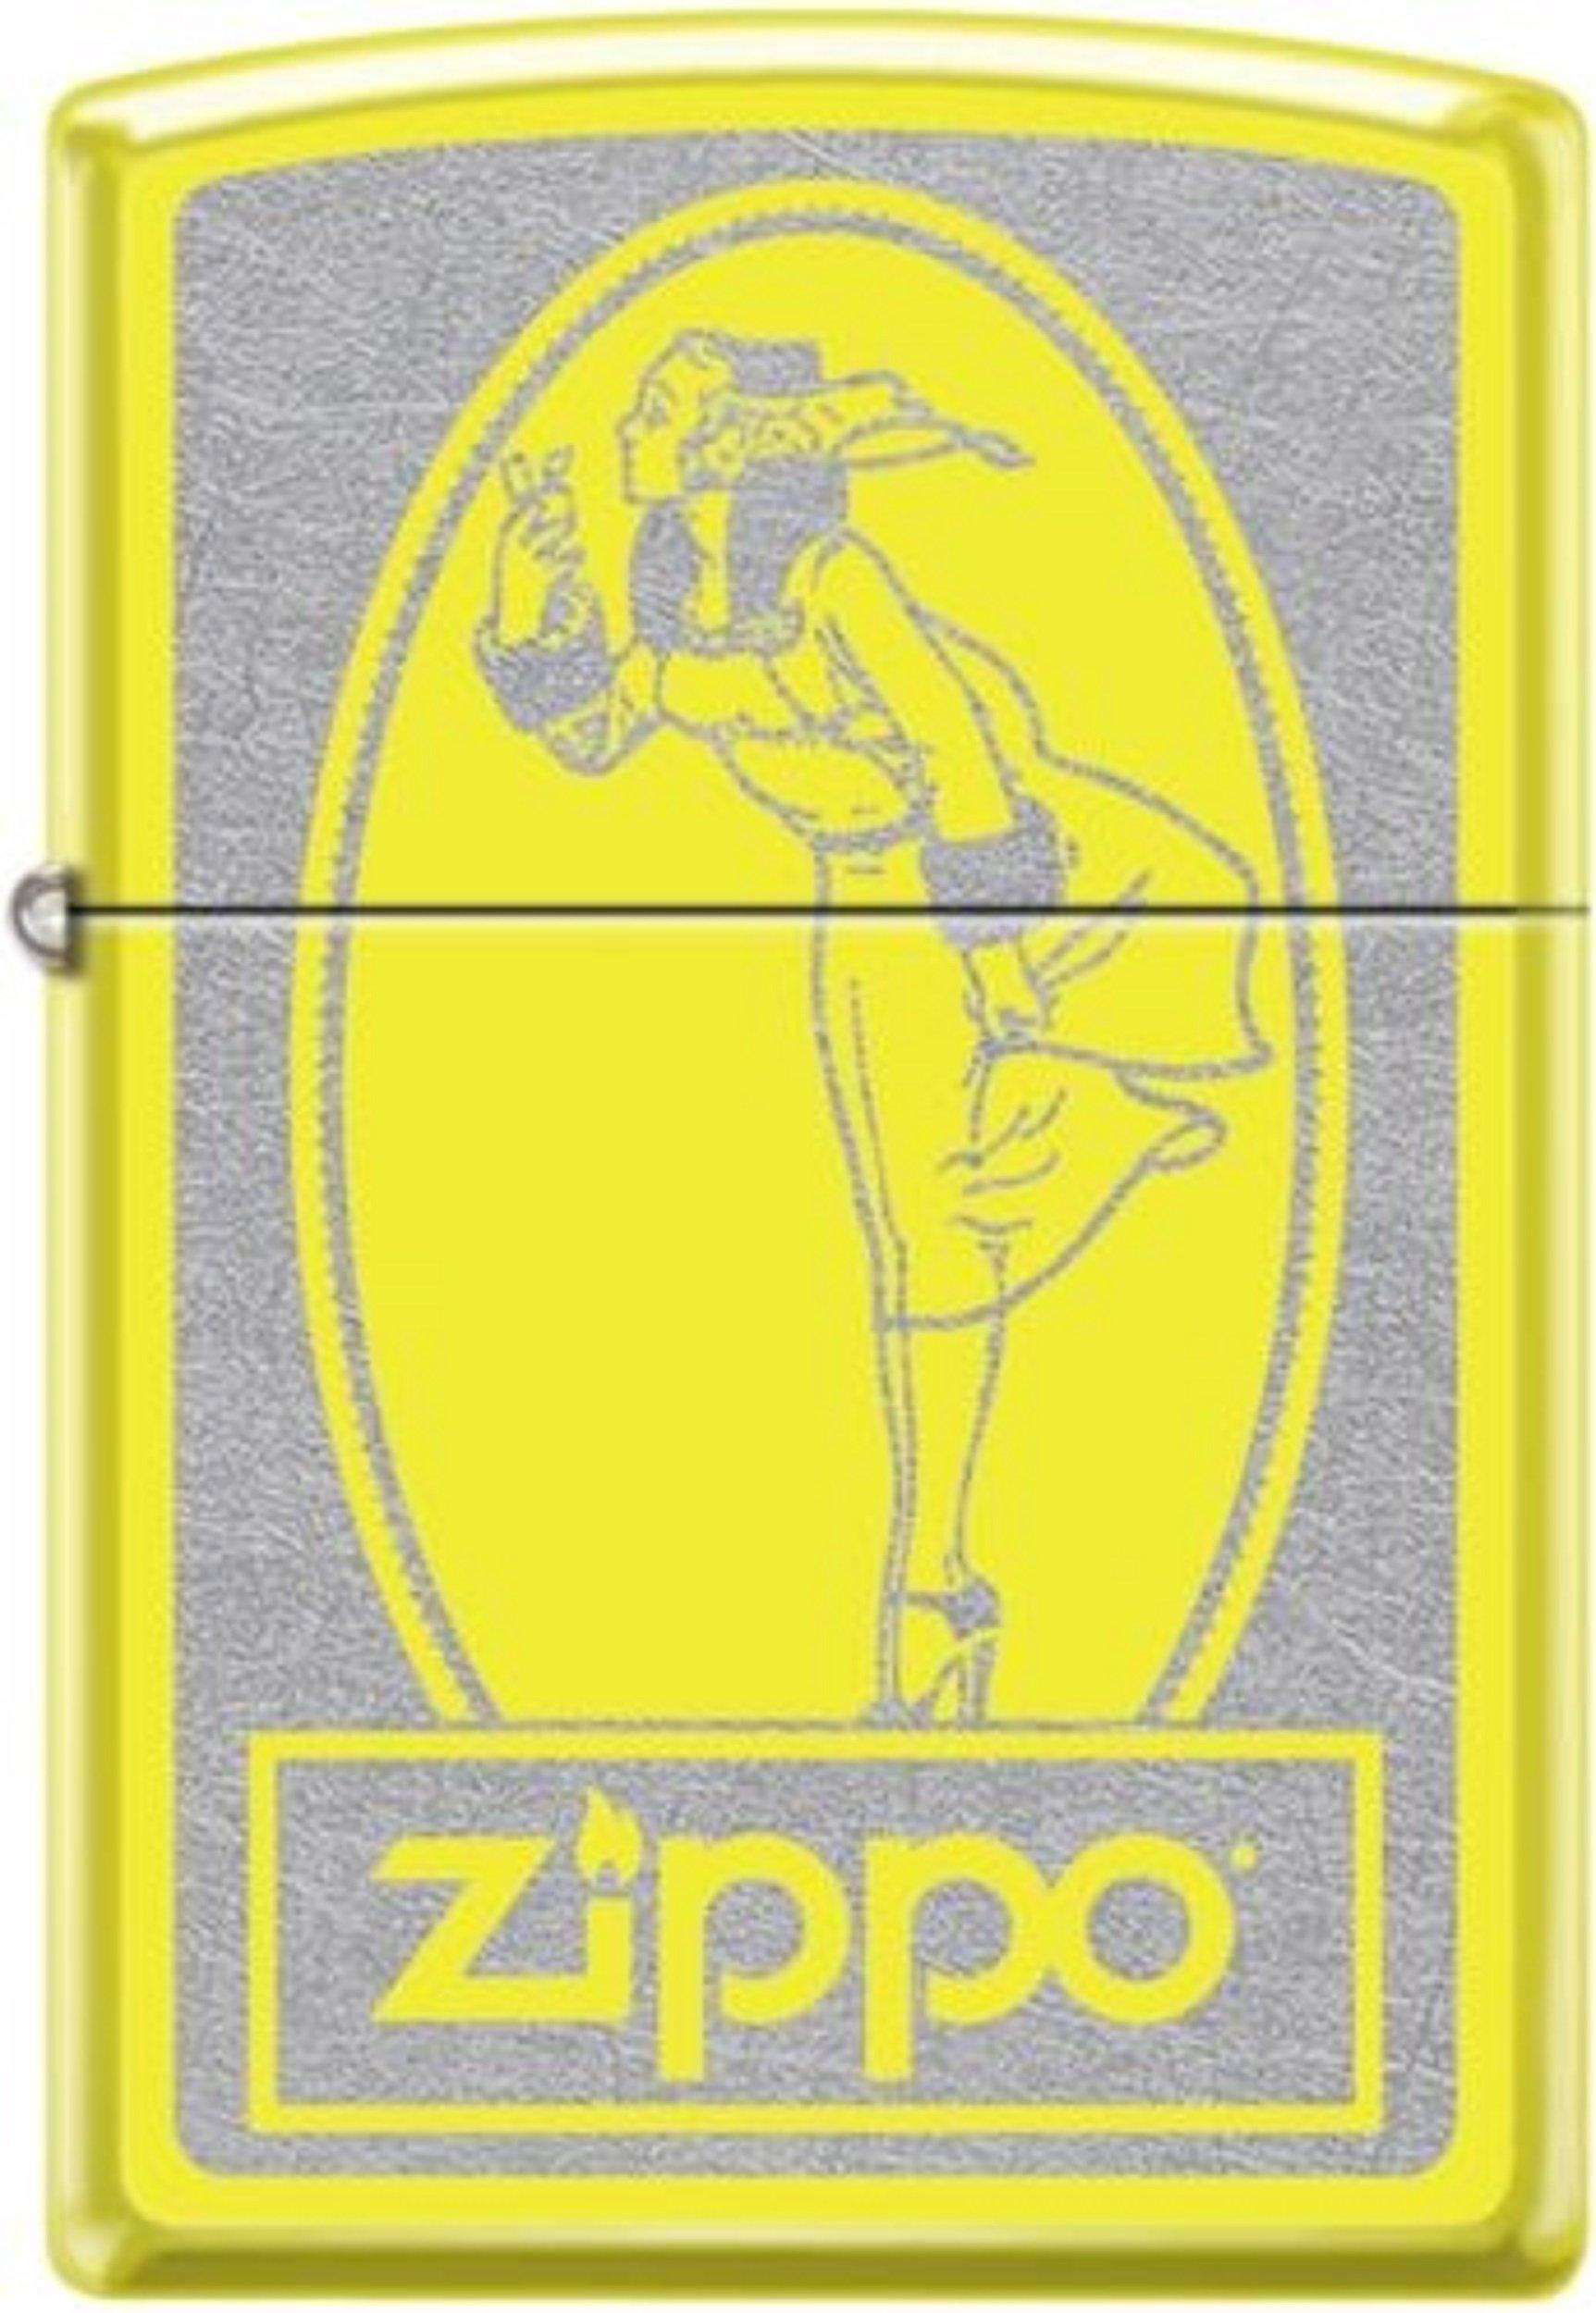 Zippo Windy Poster Yellow Orange Windproof Pocket Lighter NEW